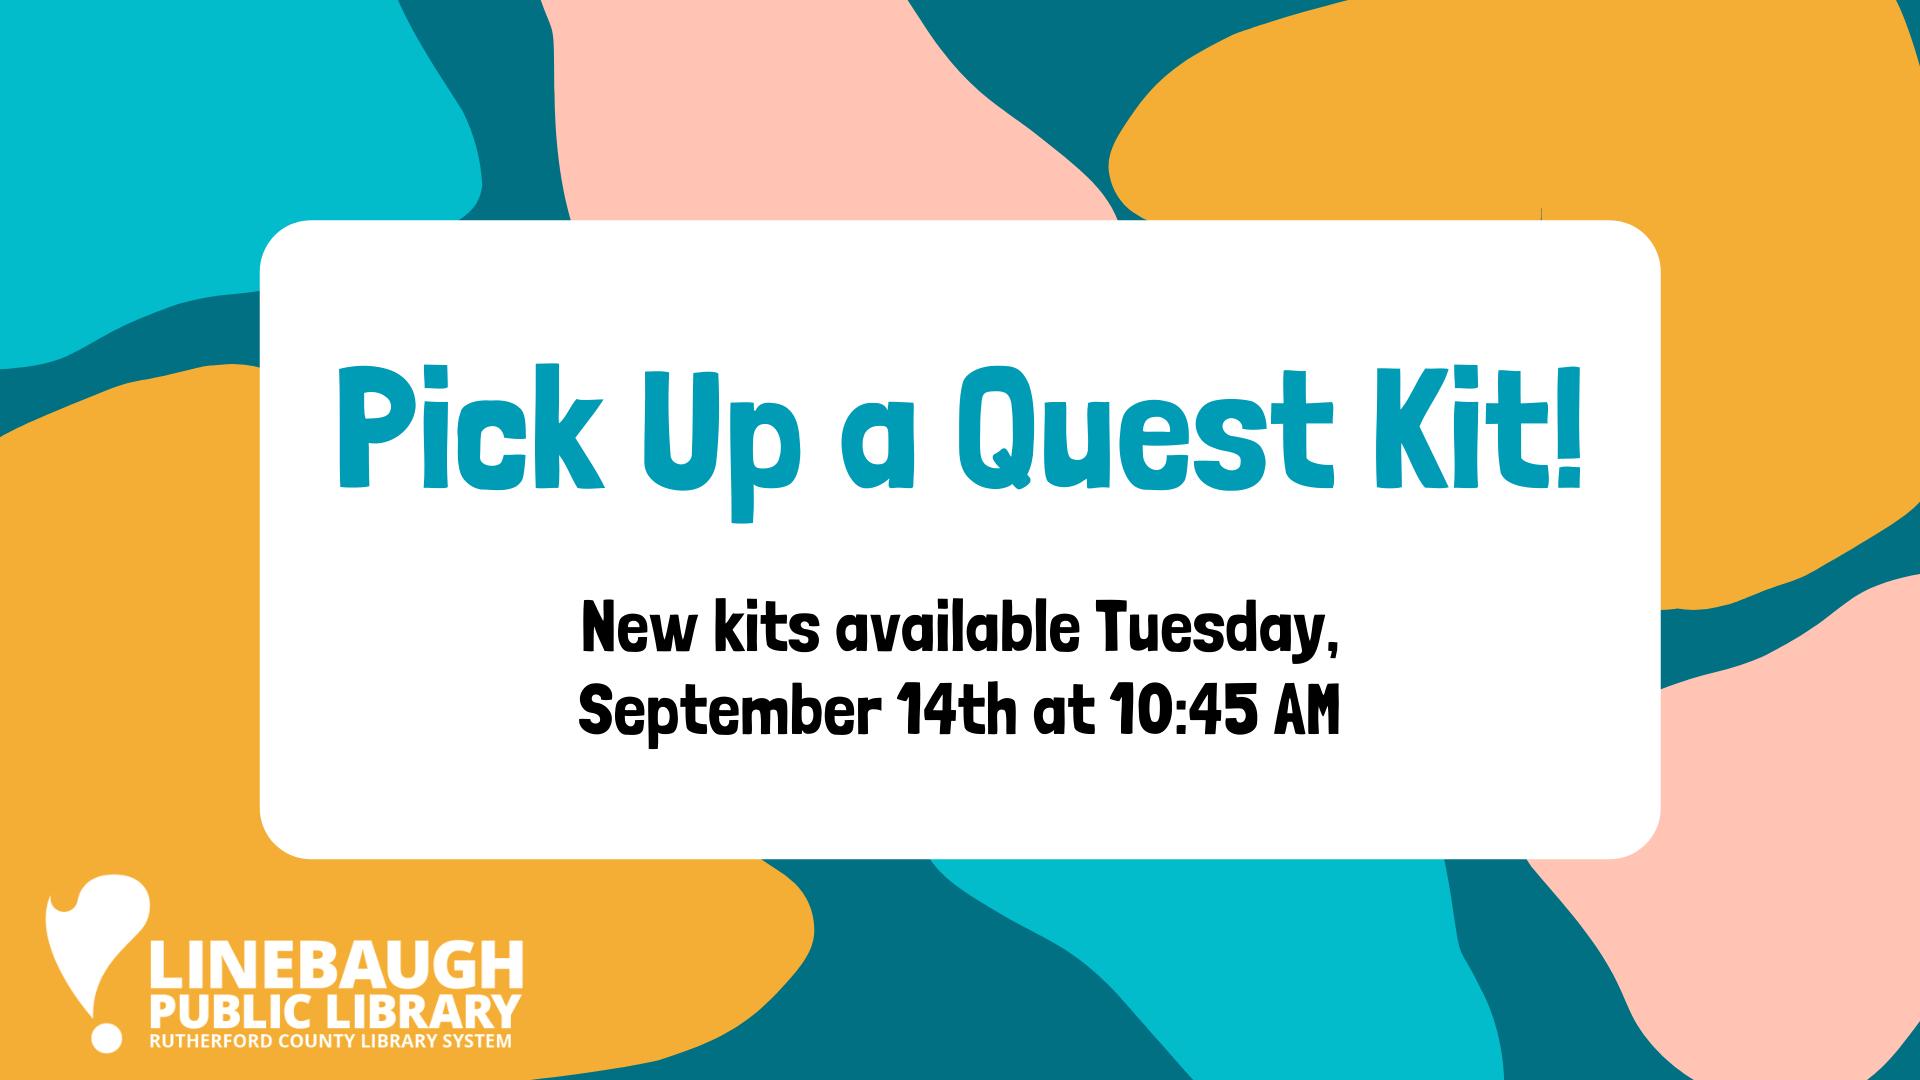 Quest Kits at Linebaugh